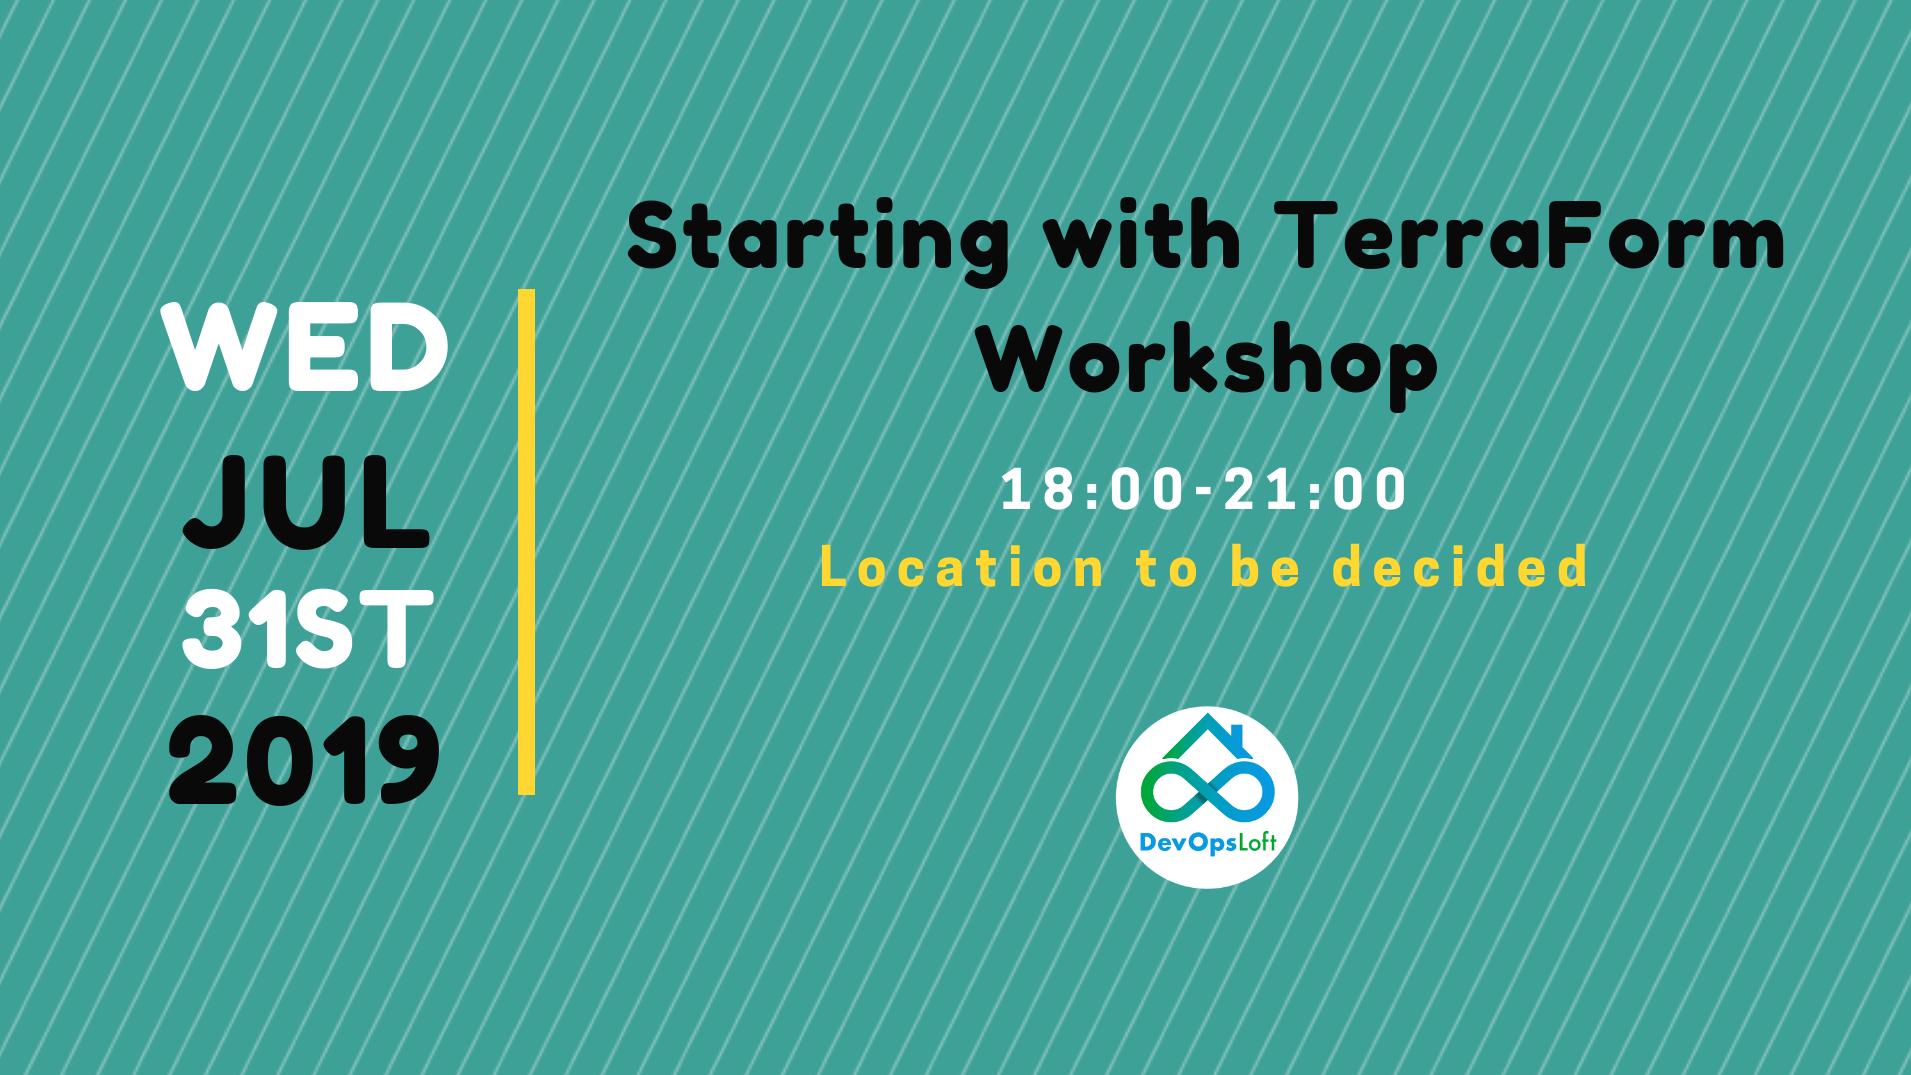 Starting with TerraForm workshop